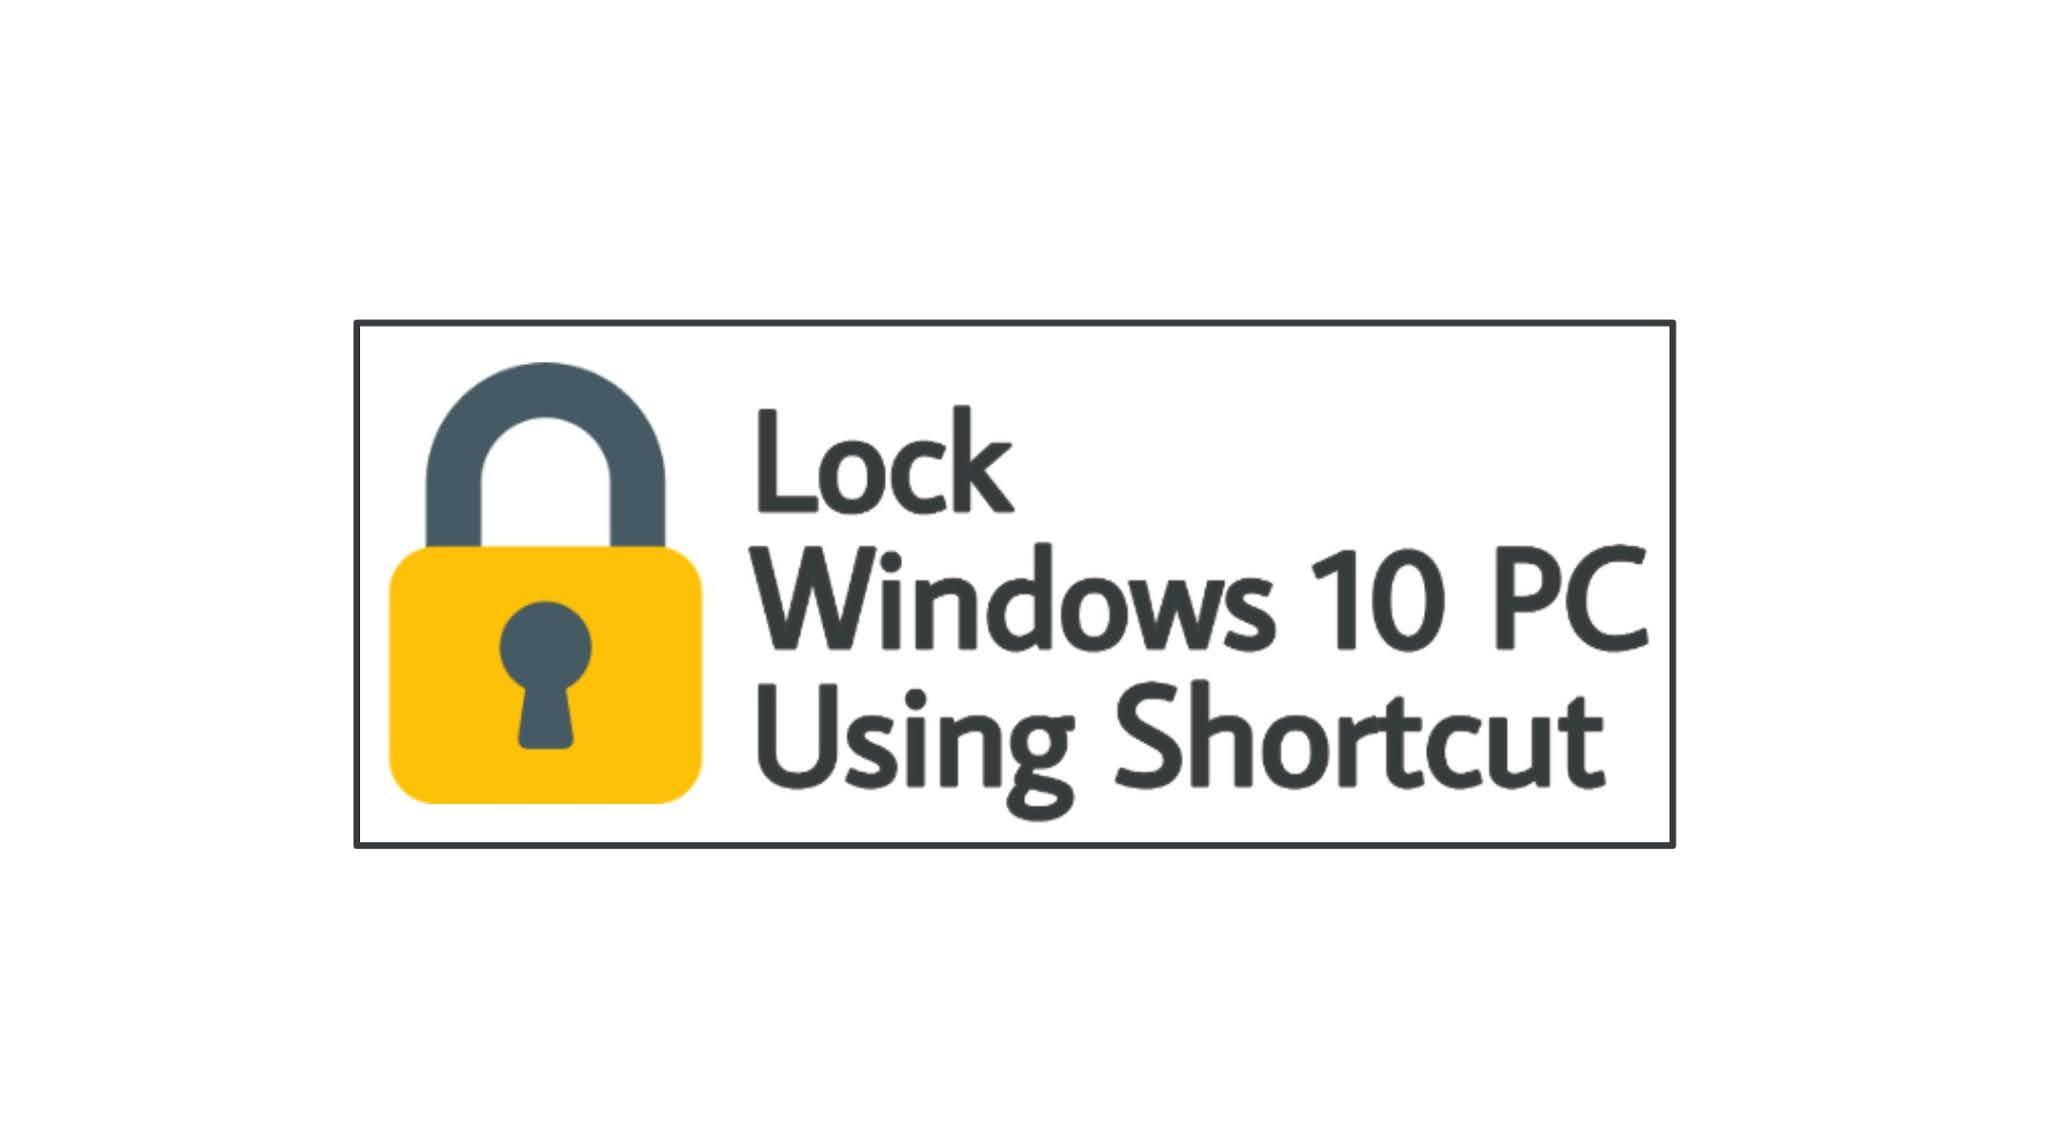 lock-windows-pc-by-using-shortcut